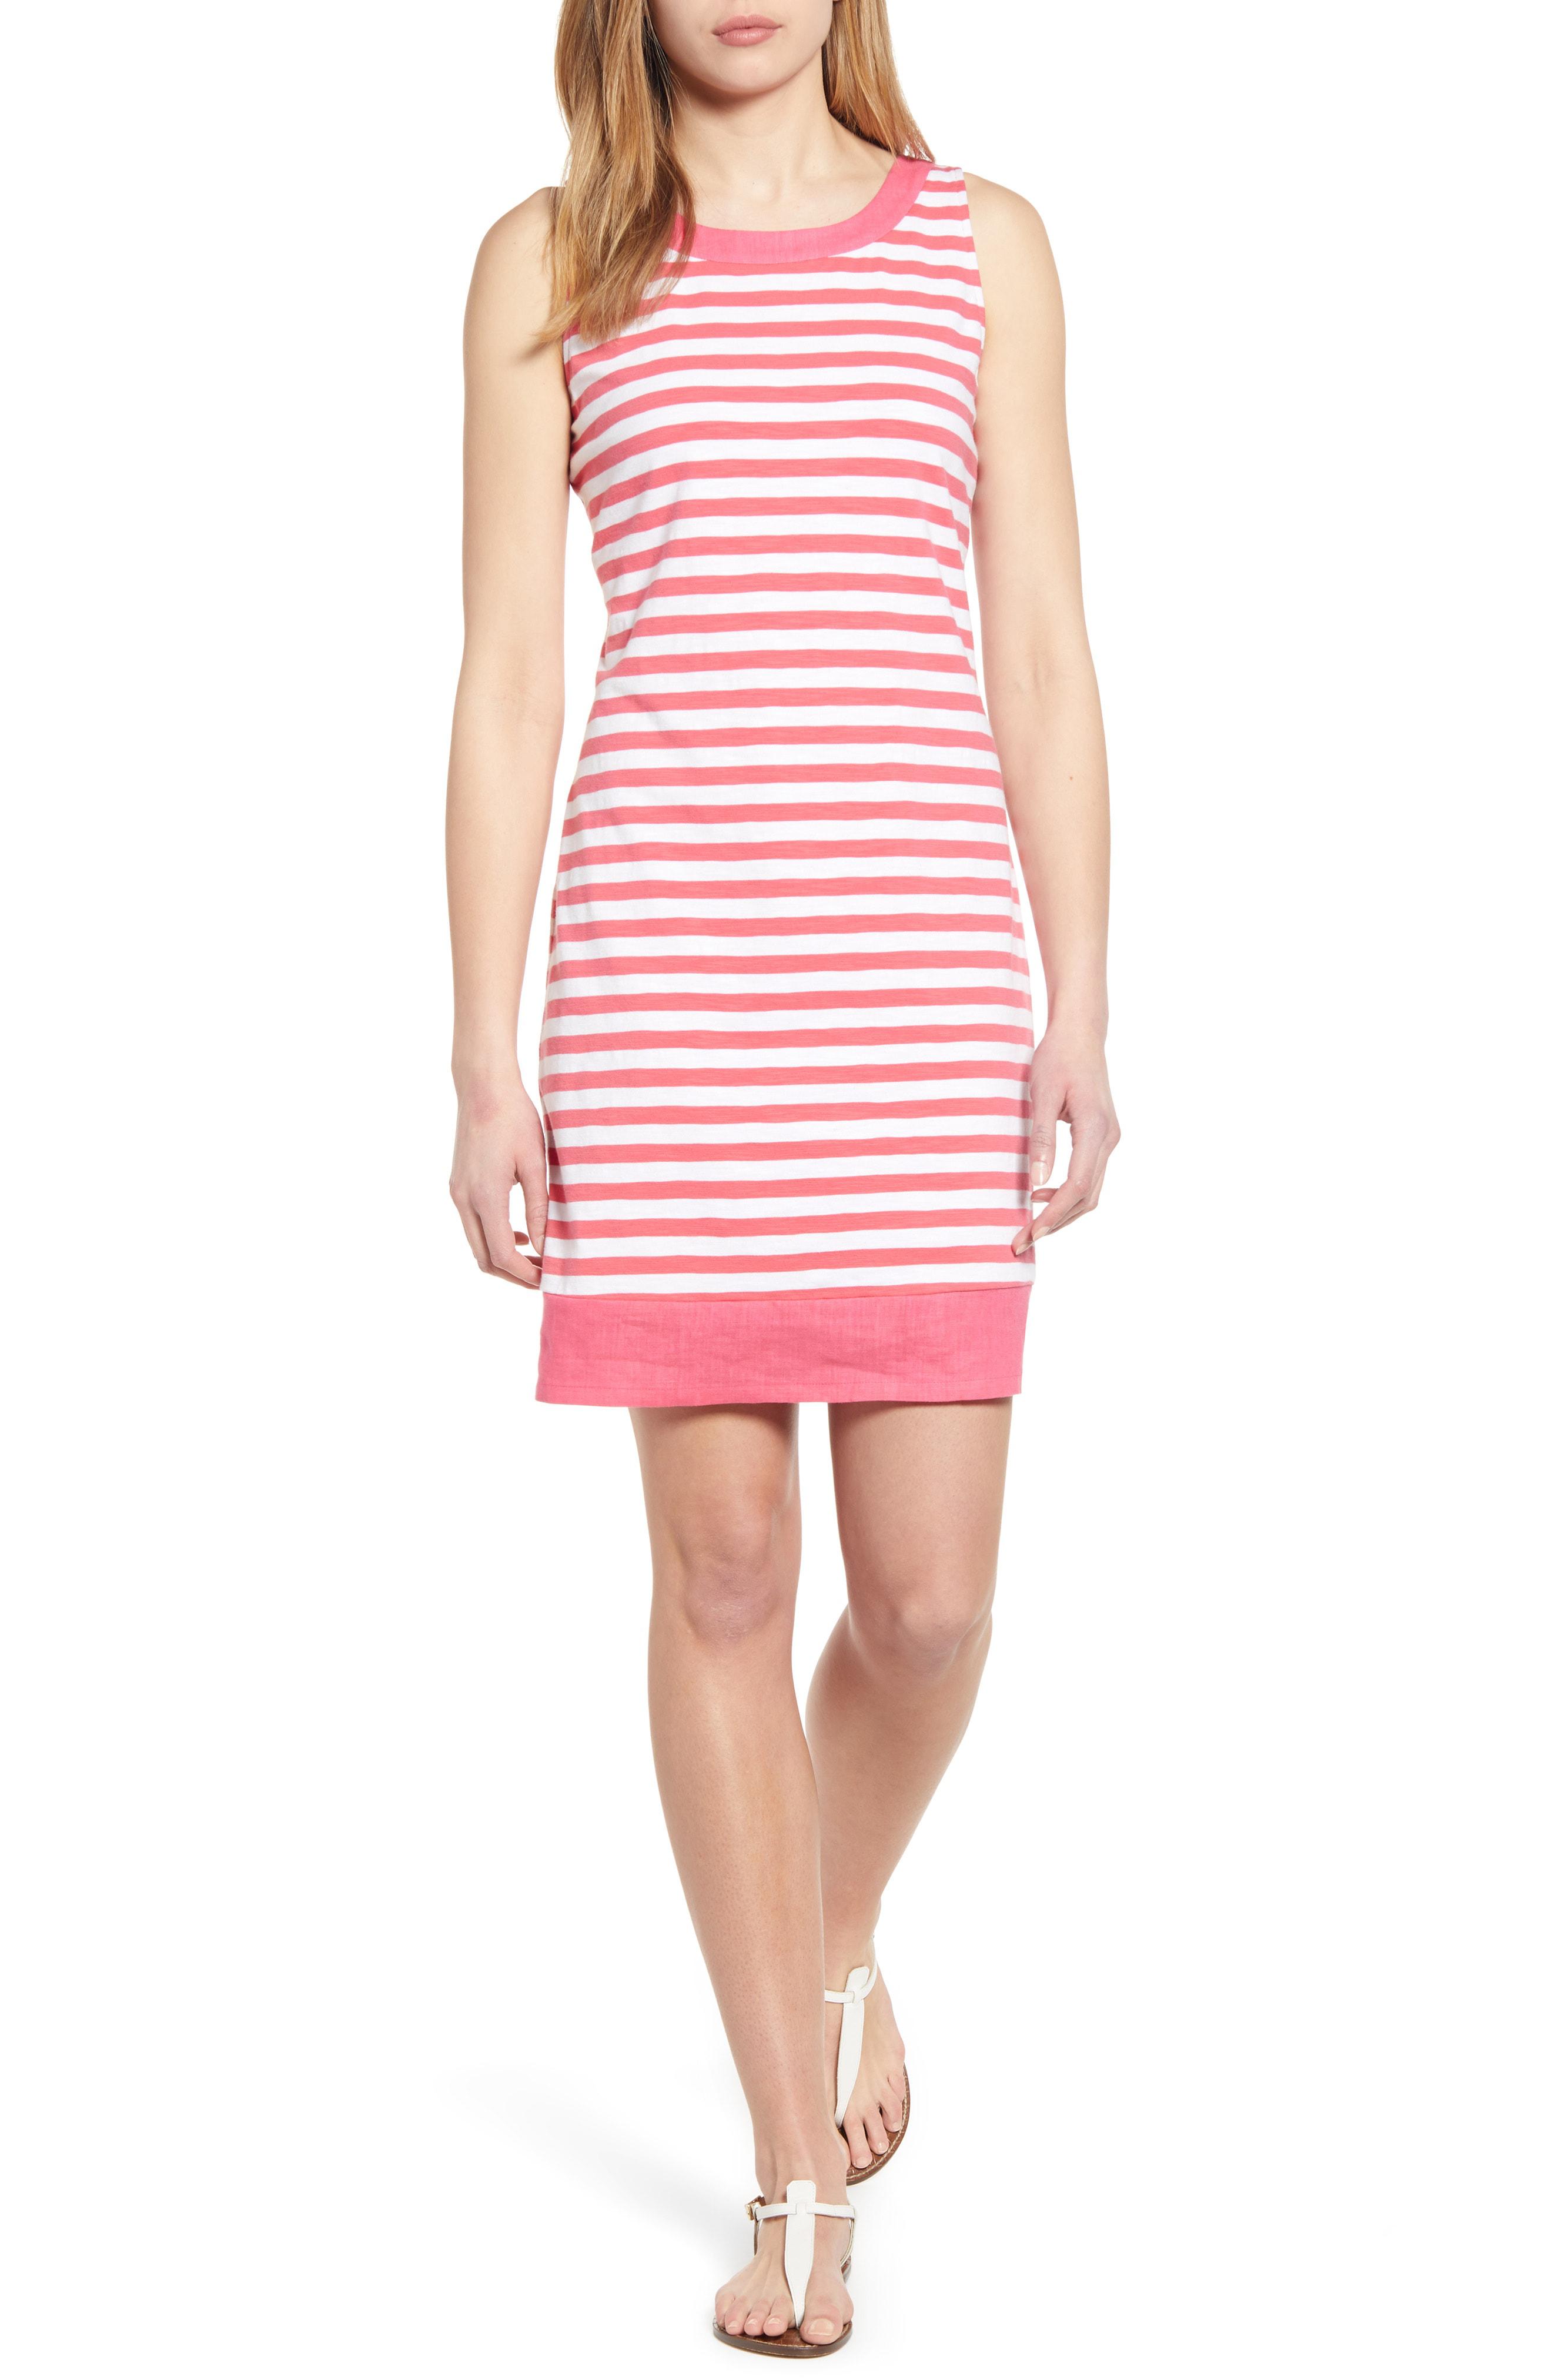 Viale Stripe Short Dress in Paradise Pink